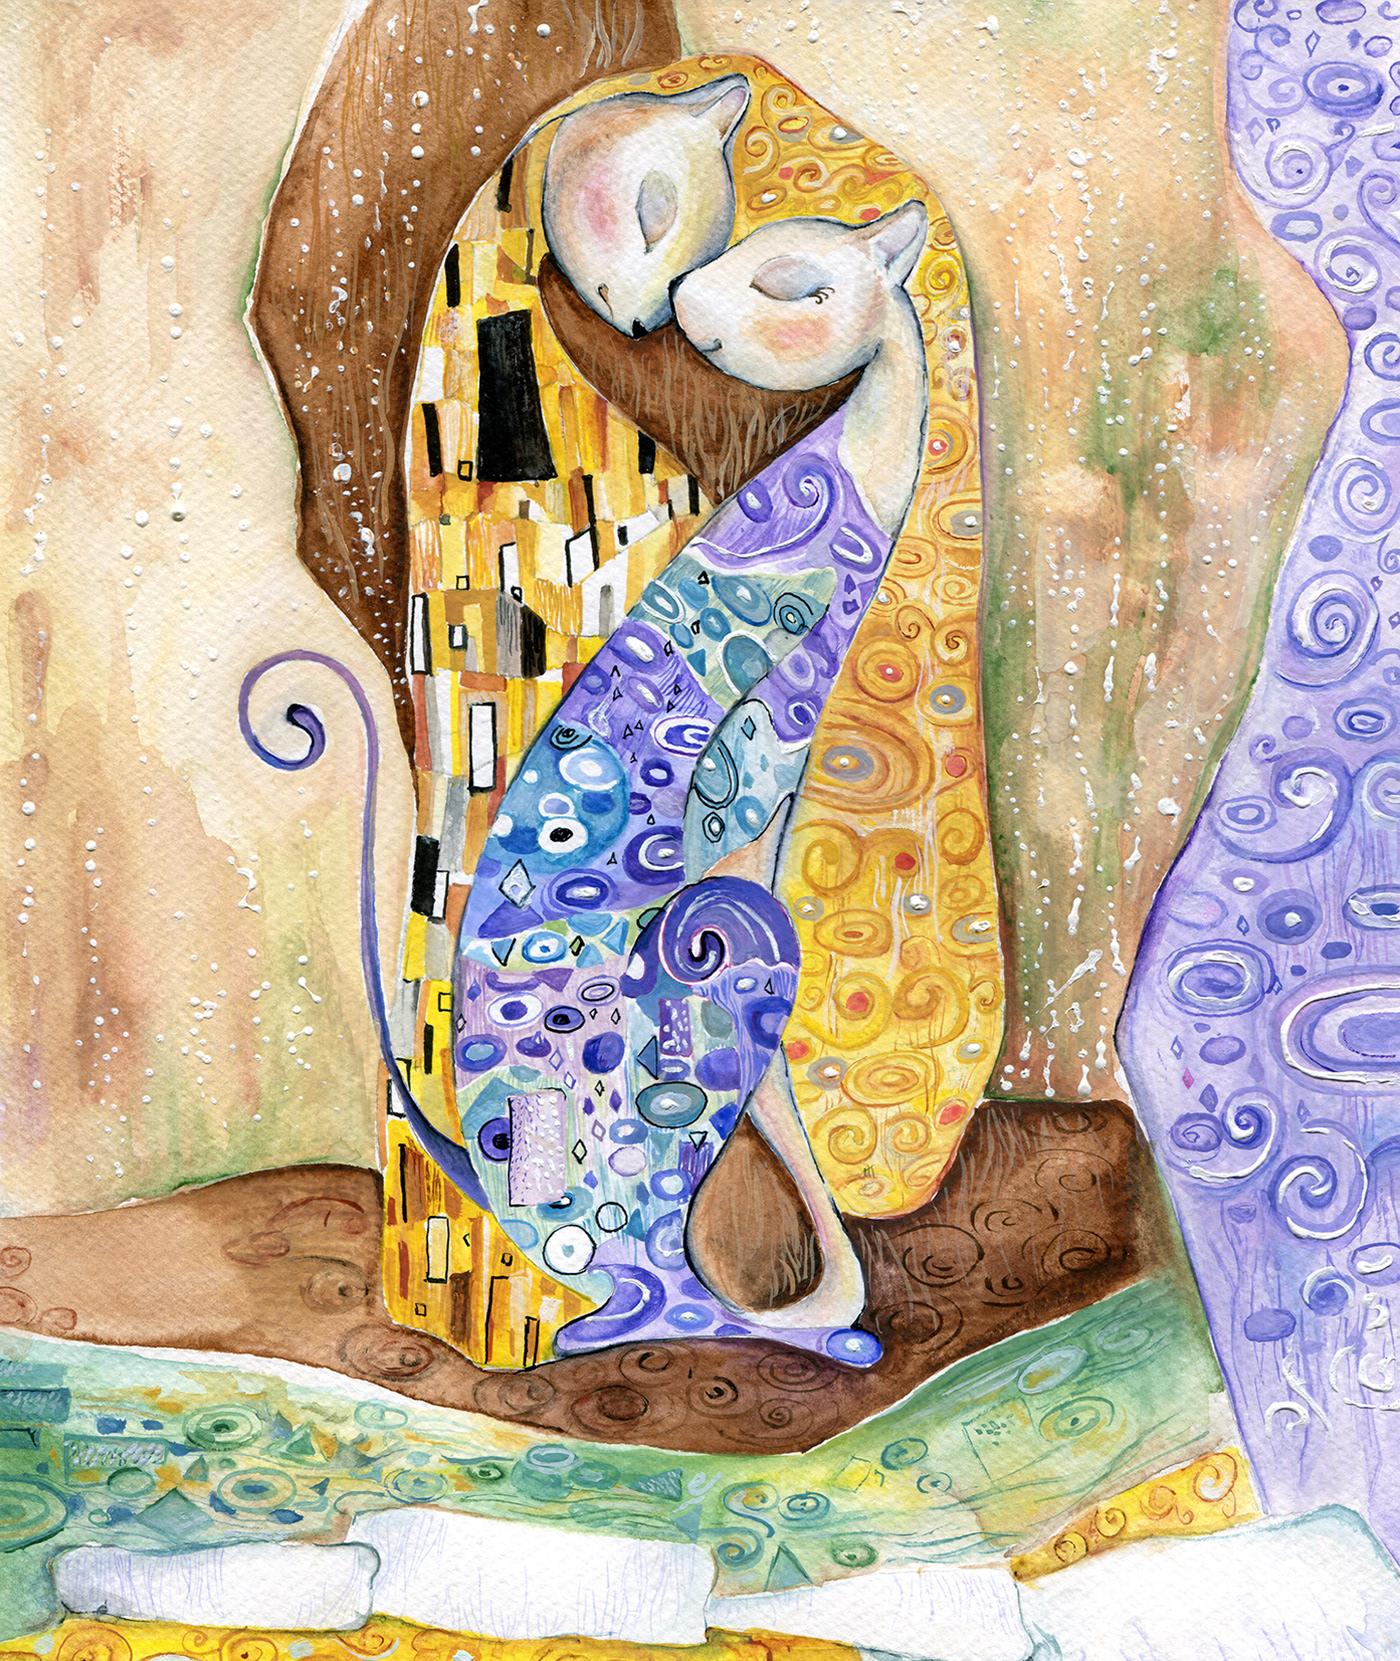 handpainted cats Picasso van gogh Klimt miro TRADITIONAL ART kandinsky illustrations prints